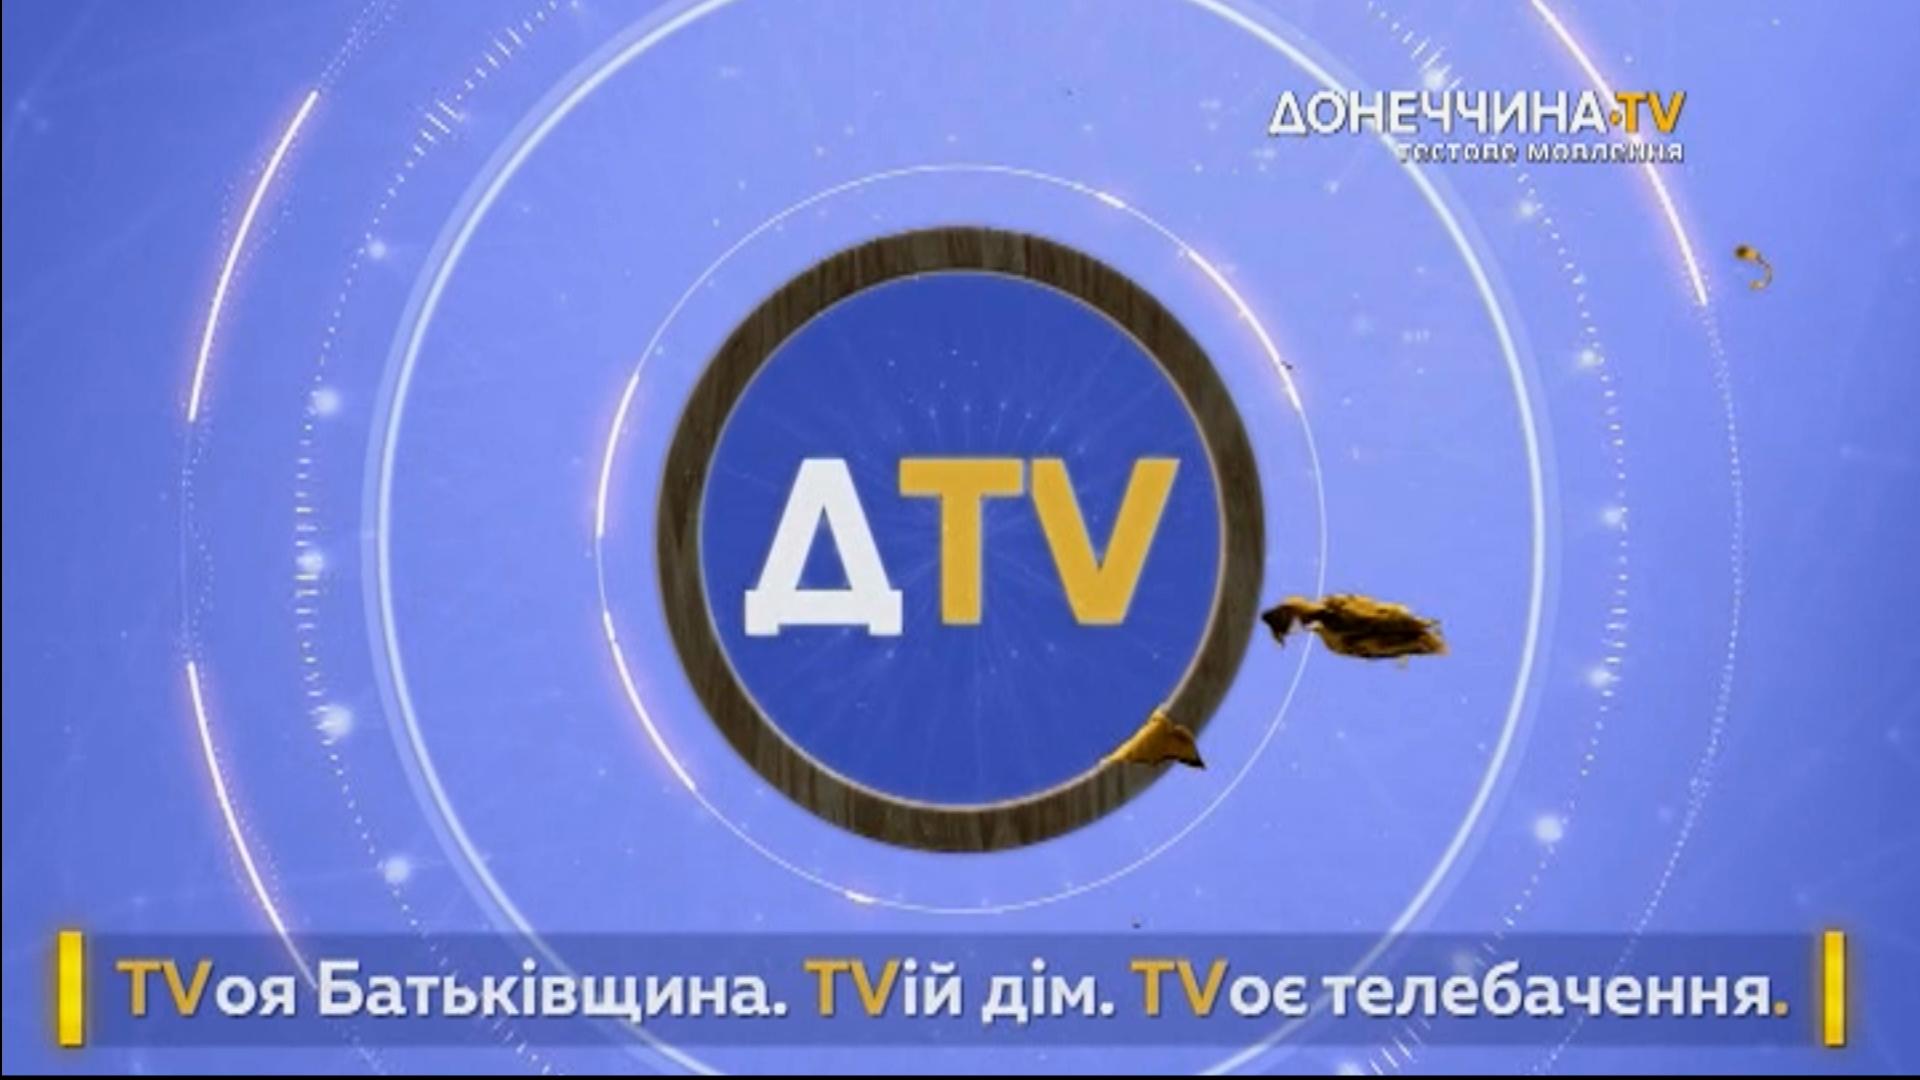 телеканал «Донеччина ТБ» («Донеччина·TV, ДTV»)